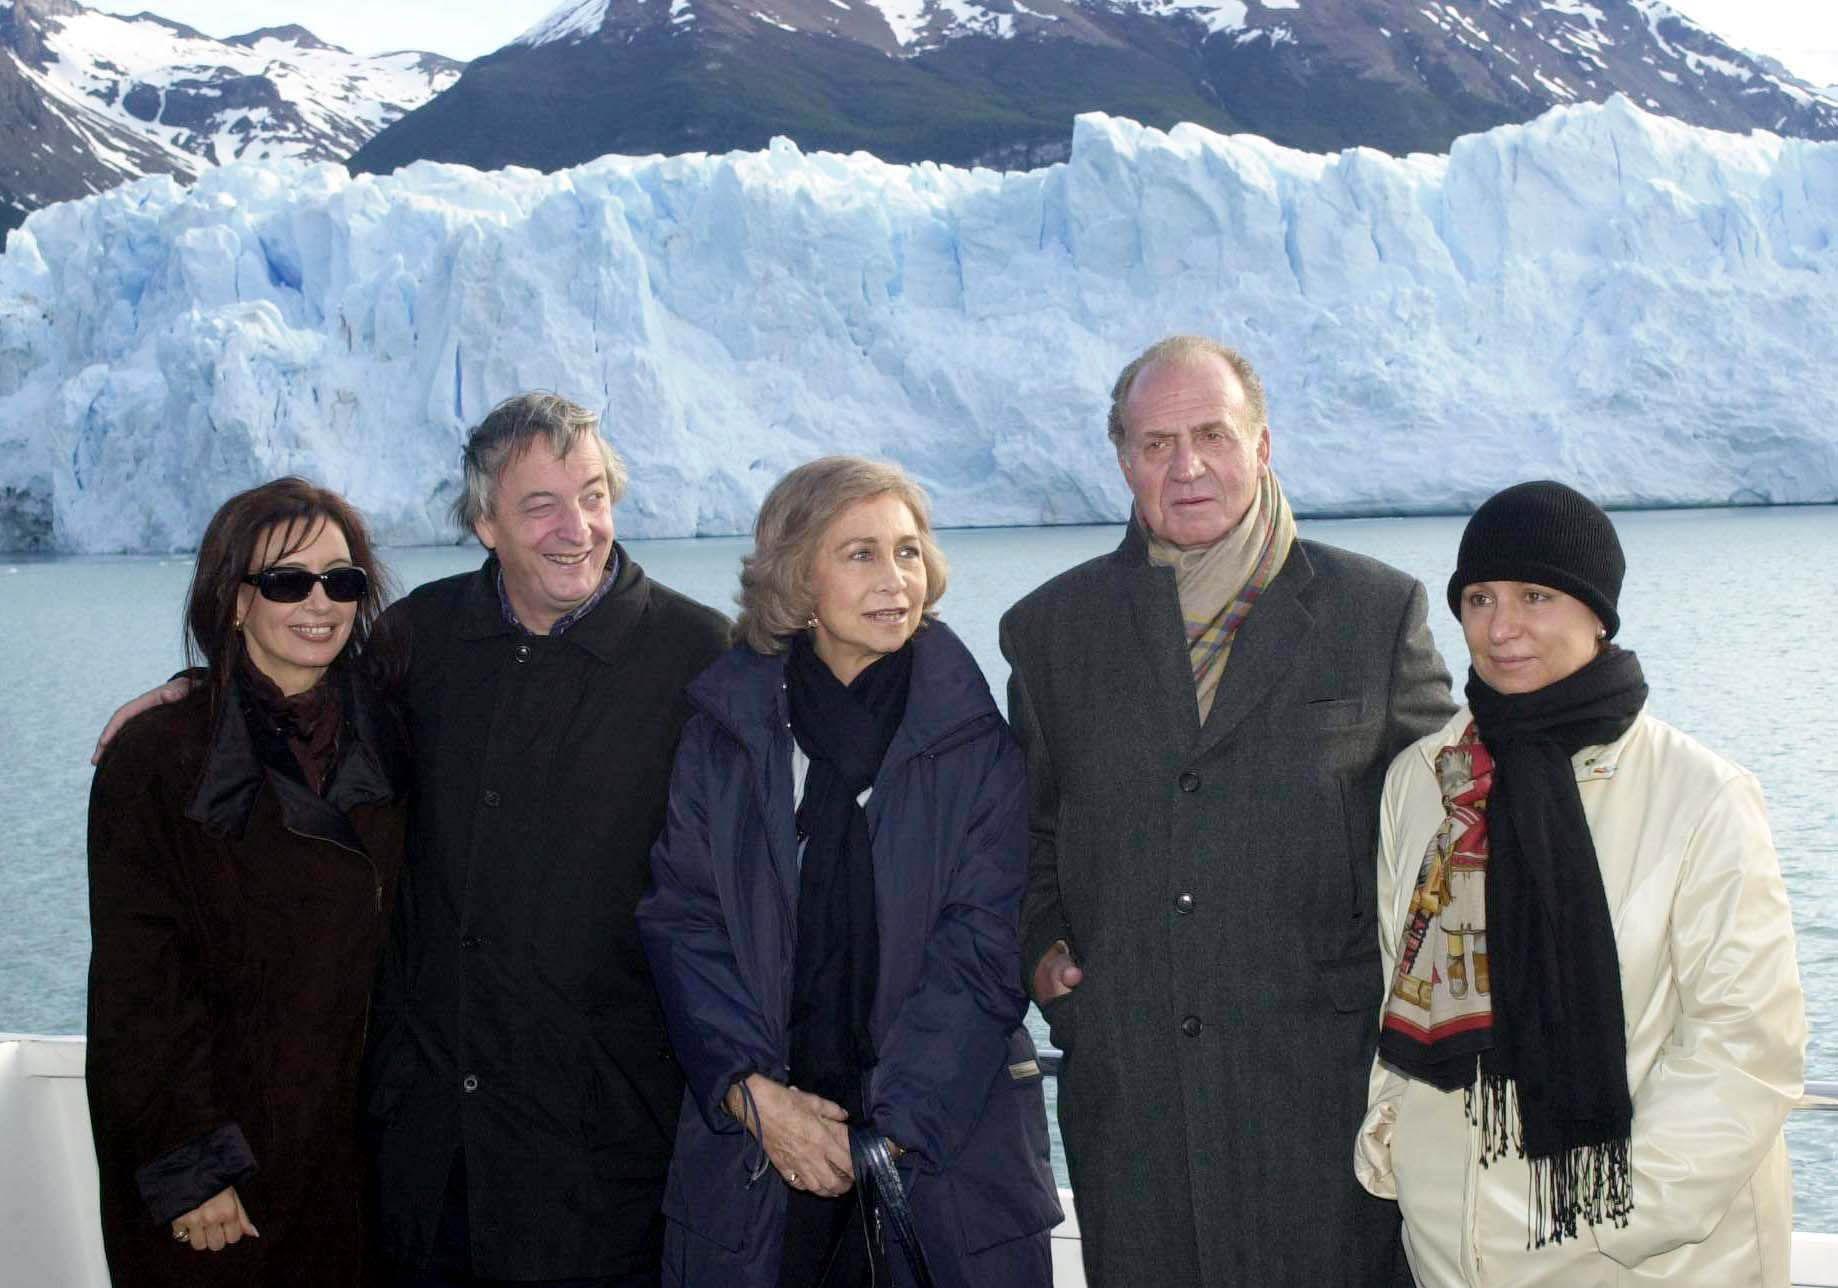 La carta de Cristina Kirchner al rey Juan Carlos: Se aleja un amigo